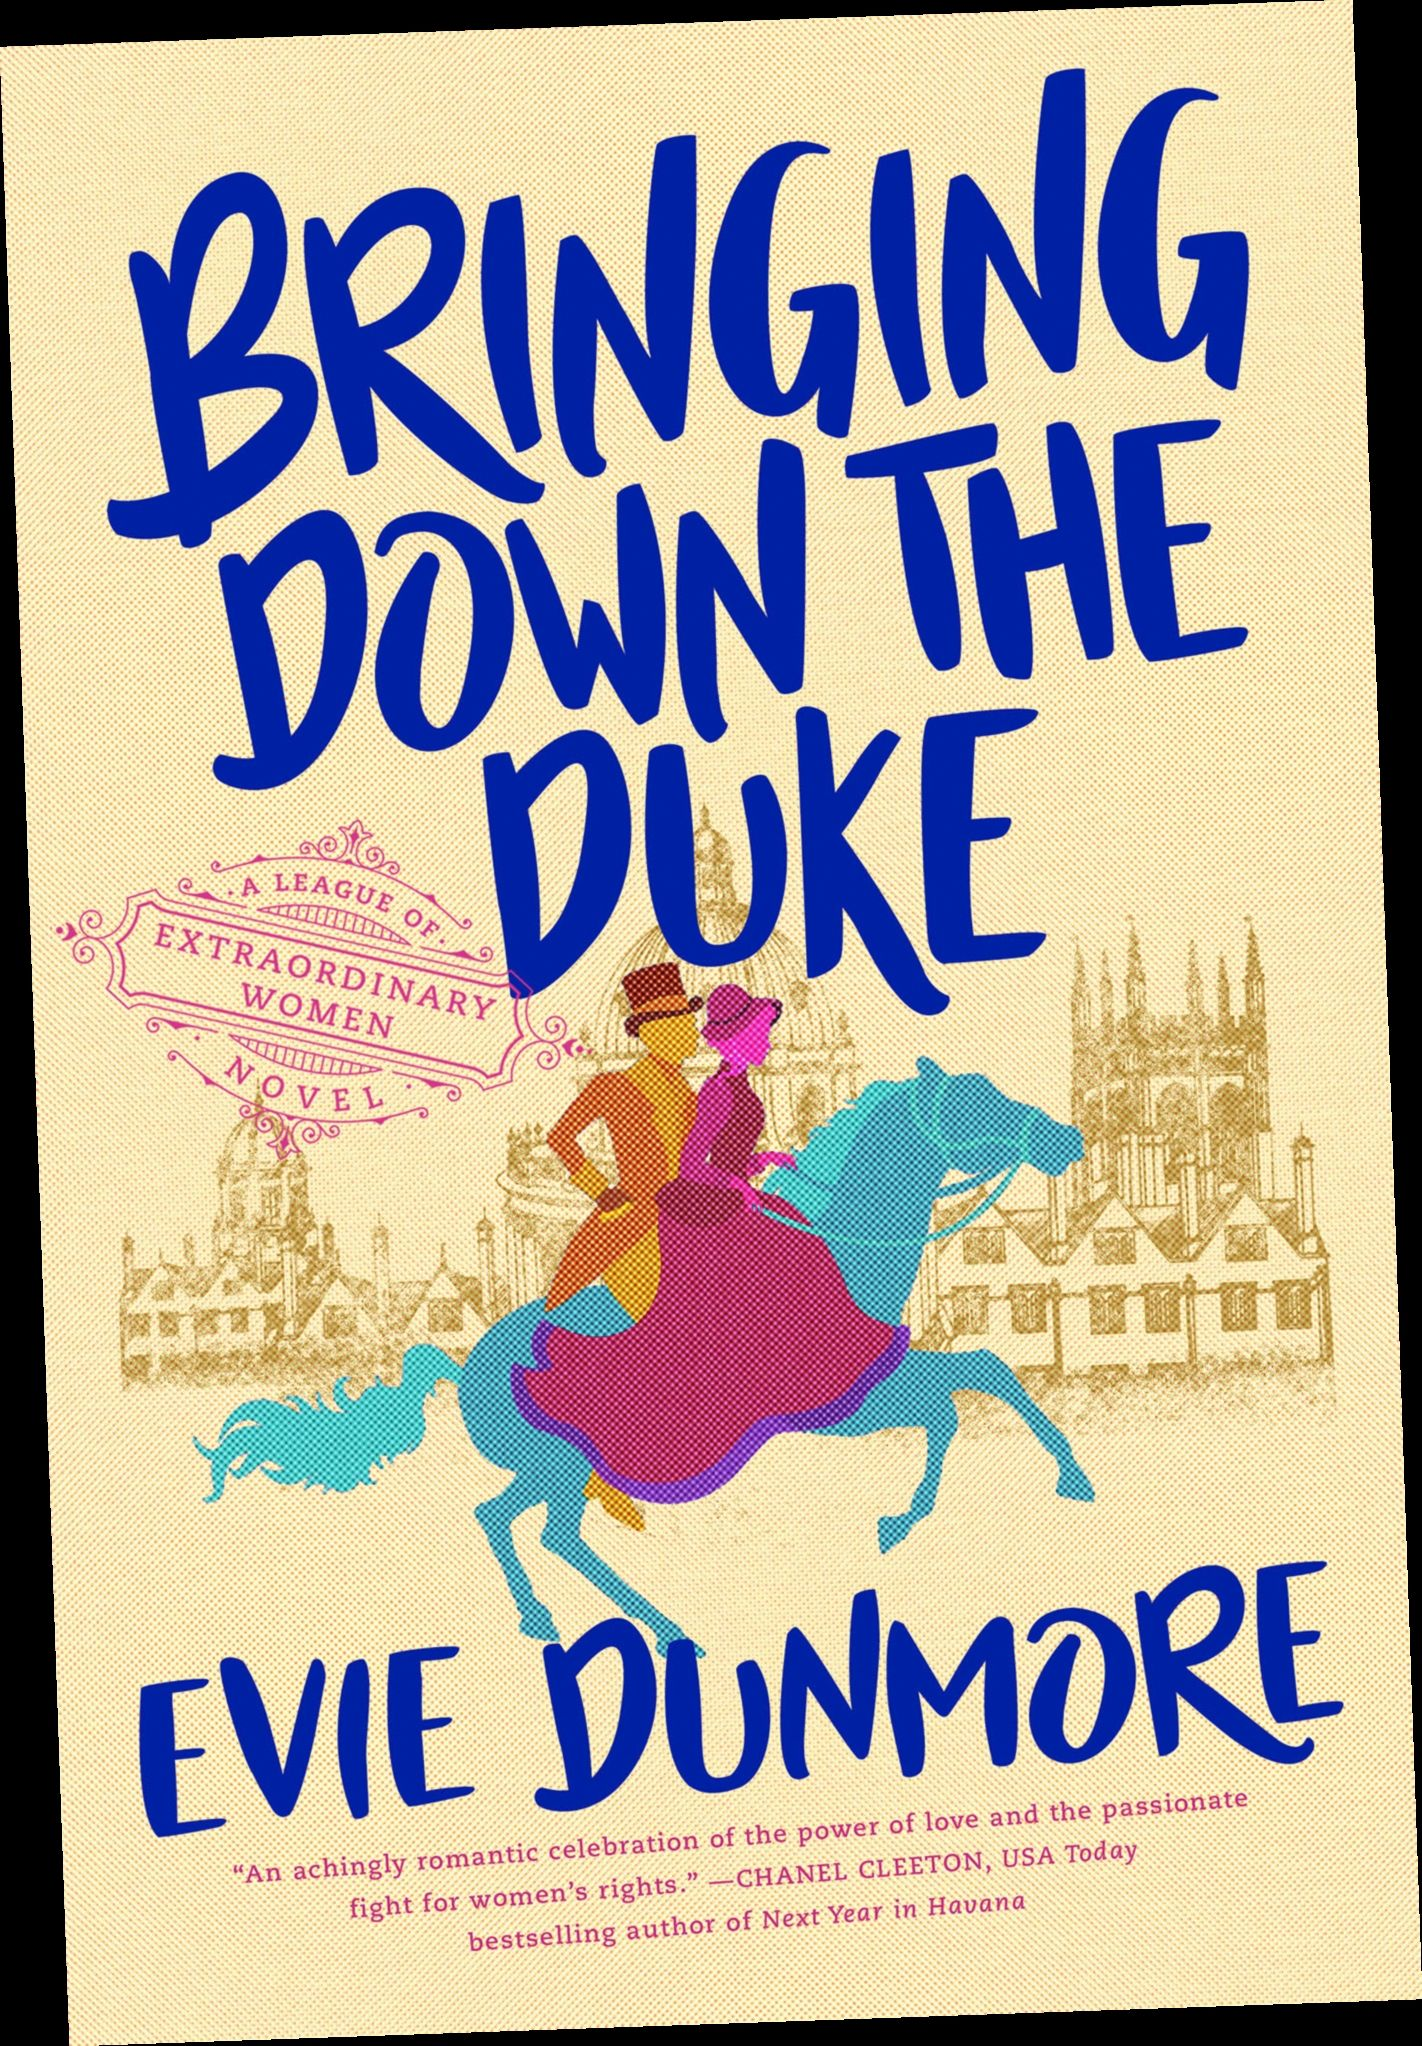 Ebook Pdf Epub Download Bringing Down The Duke By Evie Dunmore Book Authors I Love Books Romance Books